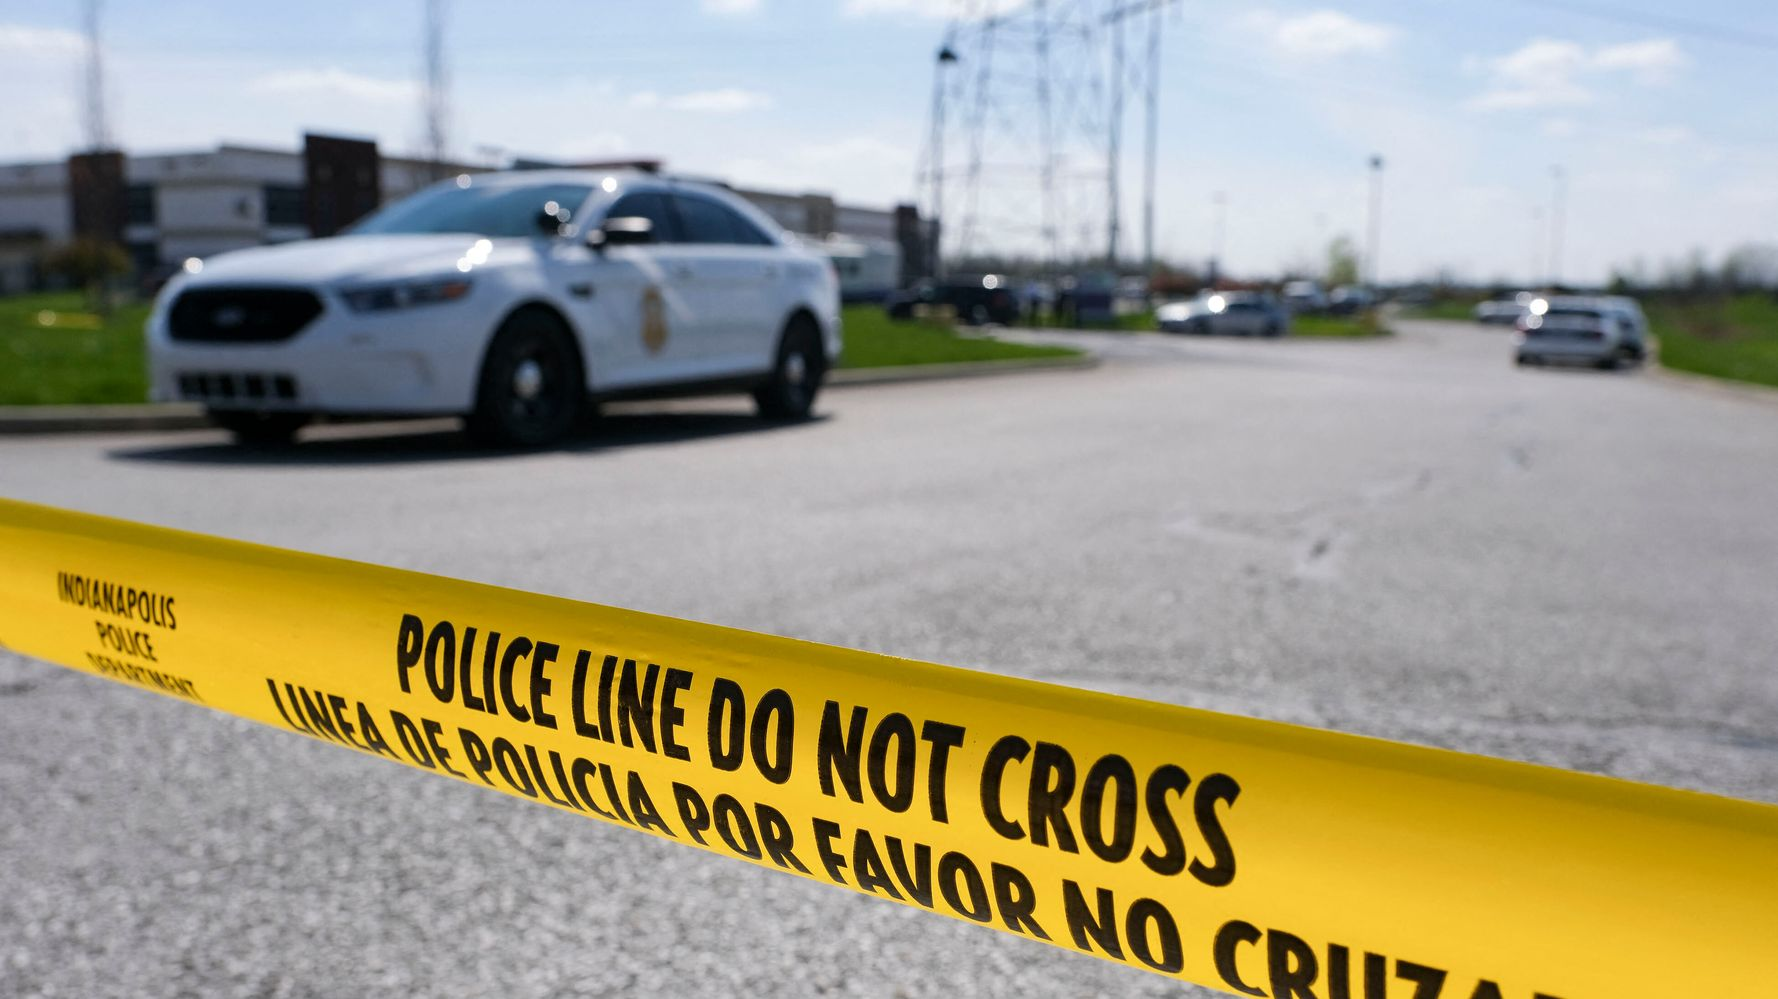 Texas Republican Panned For 'Disgraceful' Pro-Gun Tweet About Austin Shooting